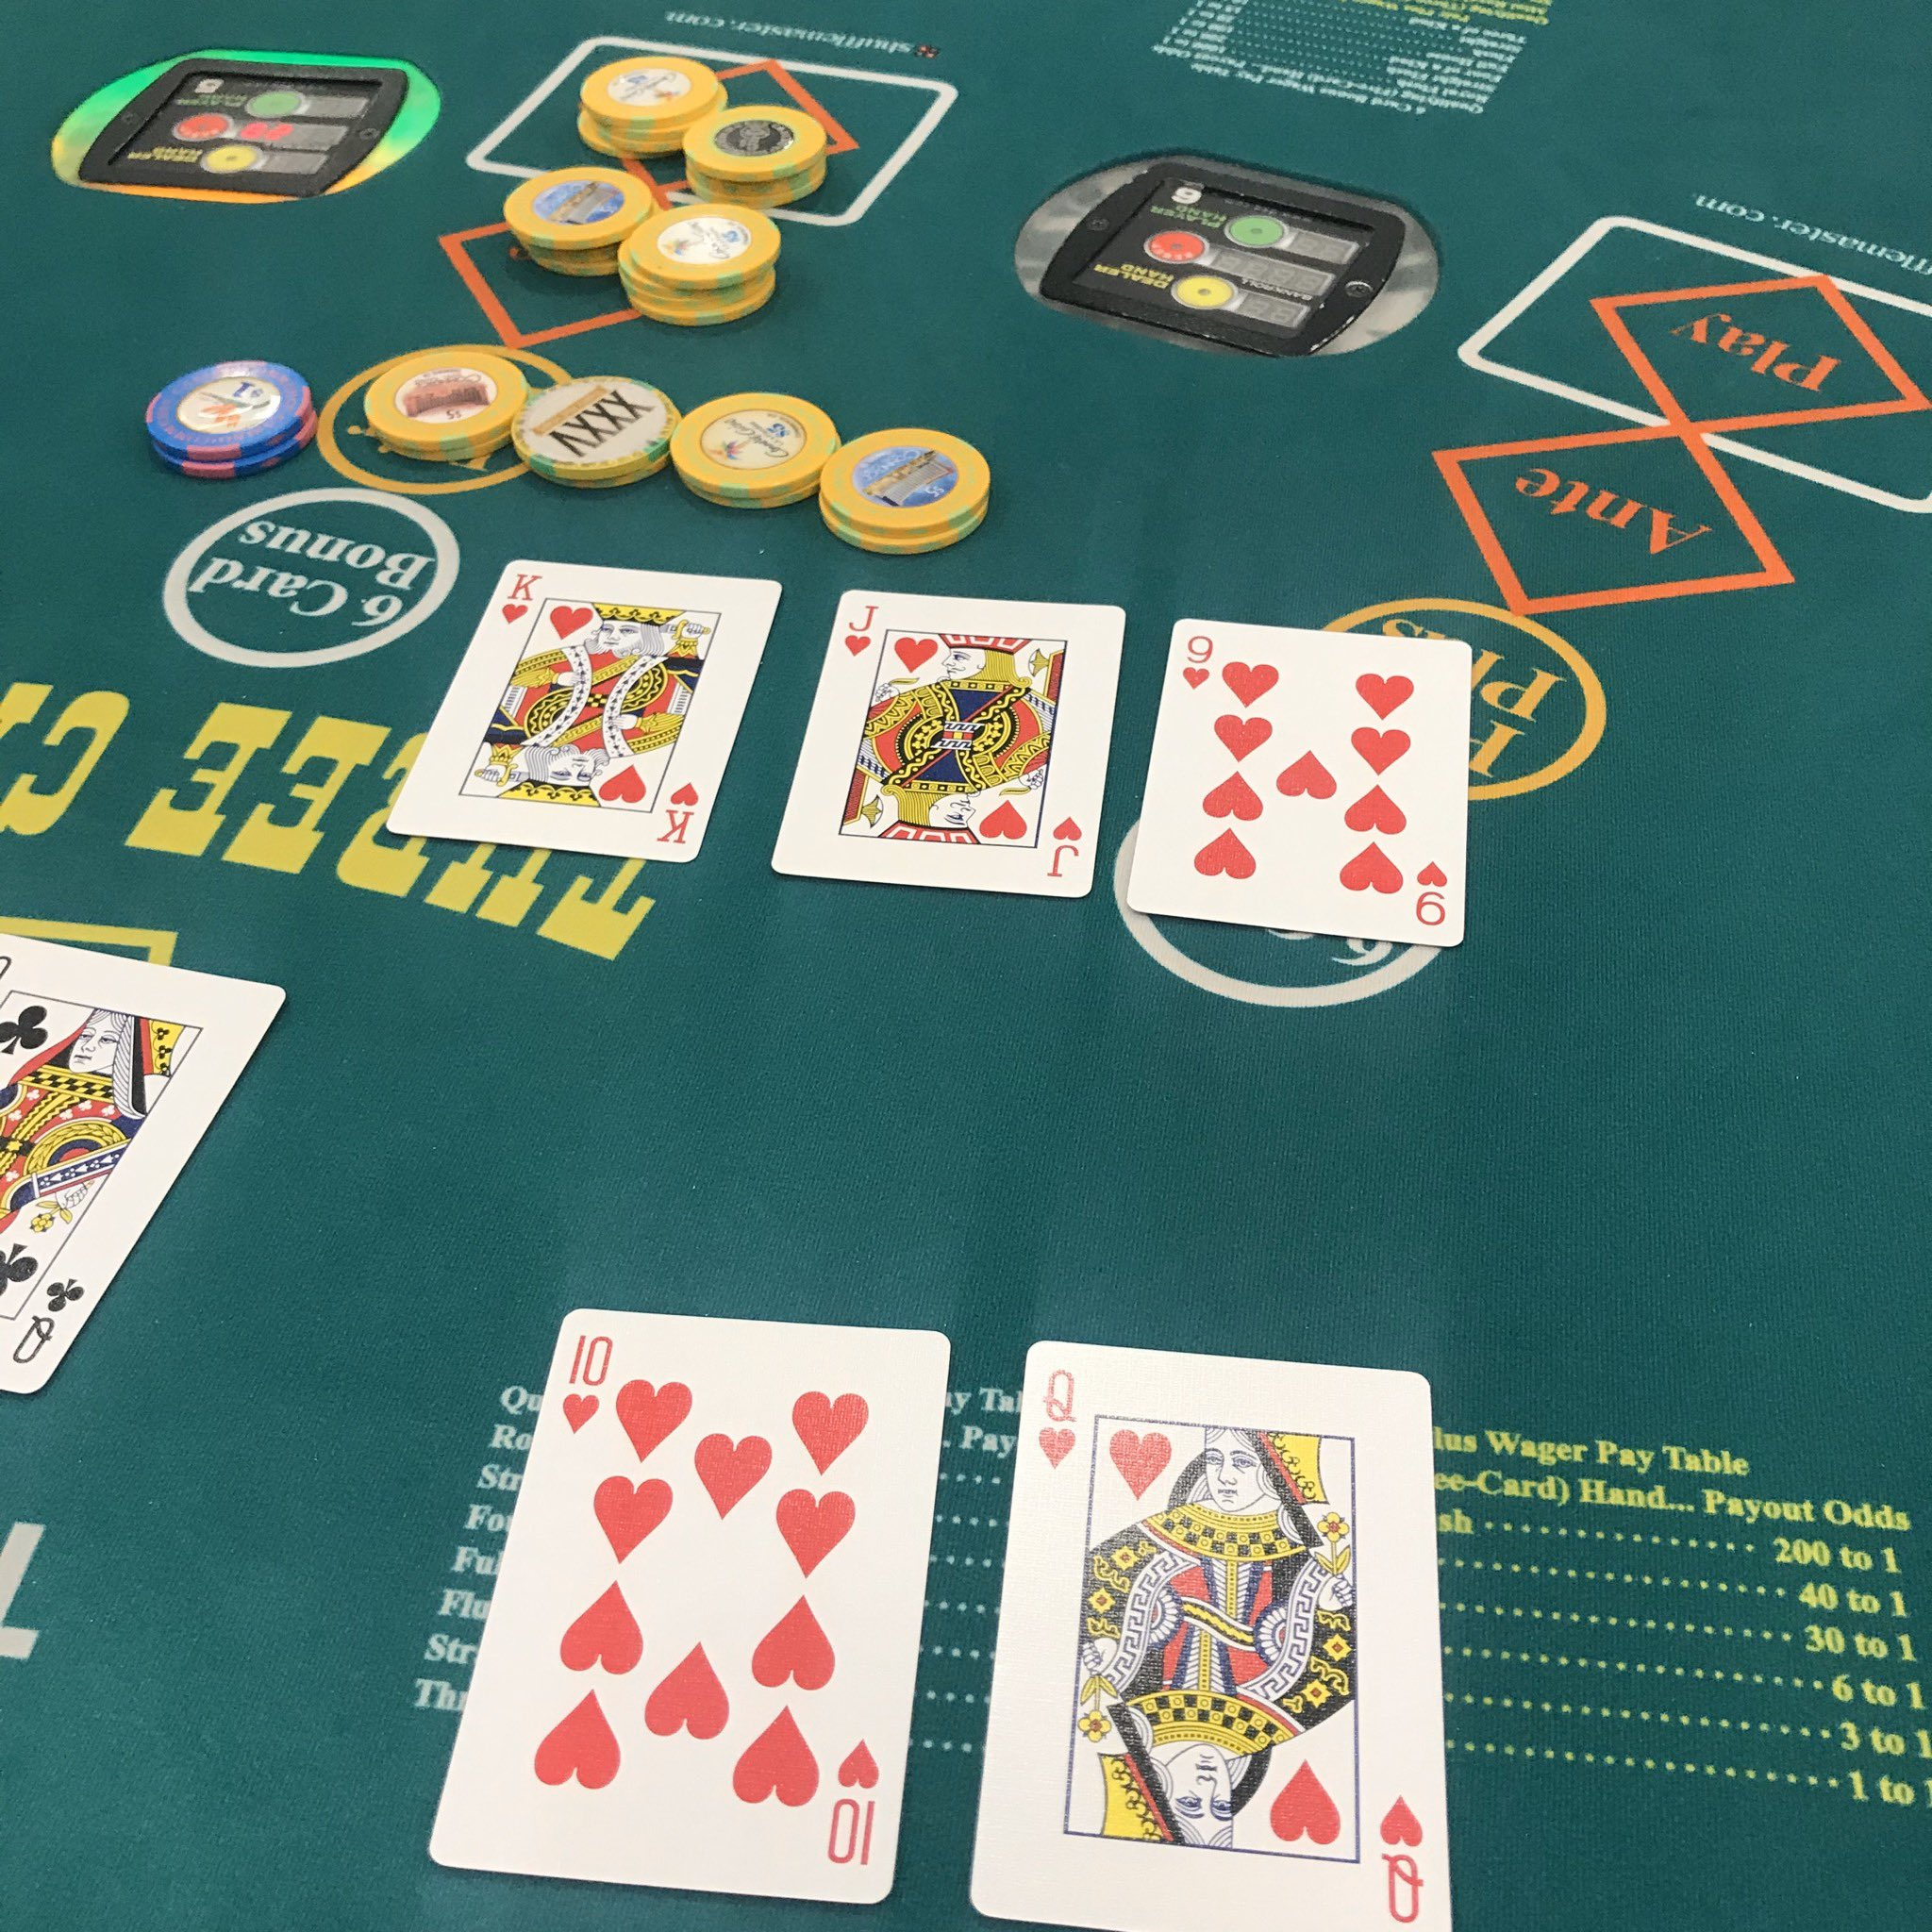 Commerce casino 3 card poker novomatic fv 624